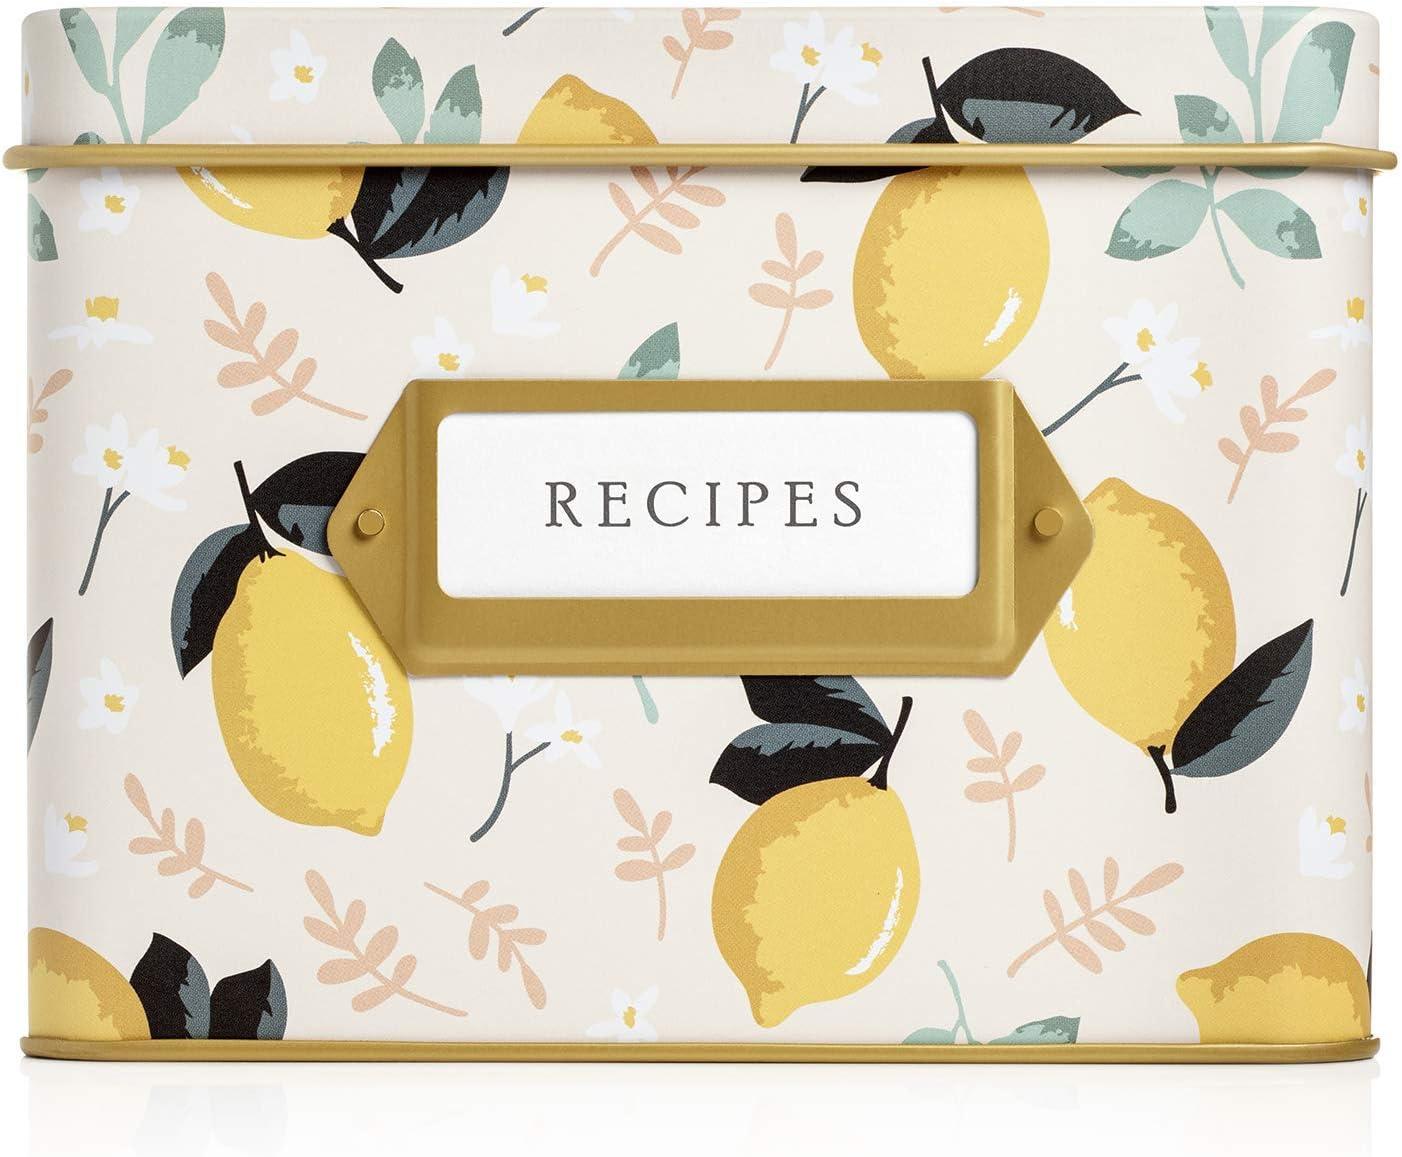 Jot & Mark Decorative Tin for Recipe Cards   Holds Hundreds of 4x6 Cards (Lemon Zest)